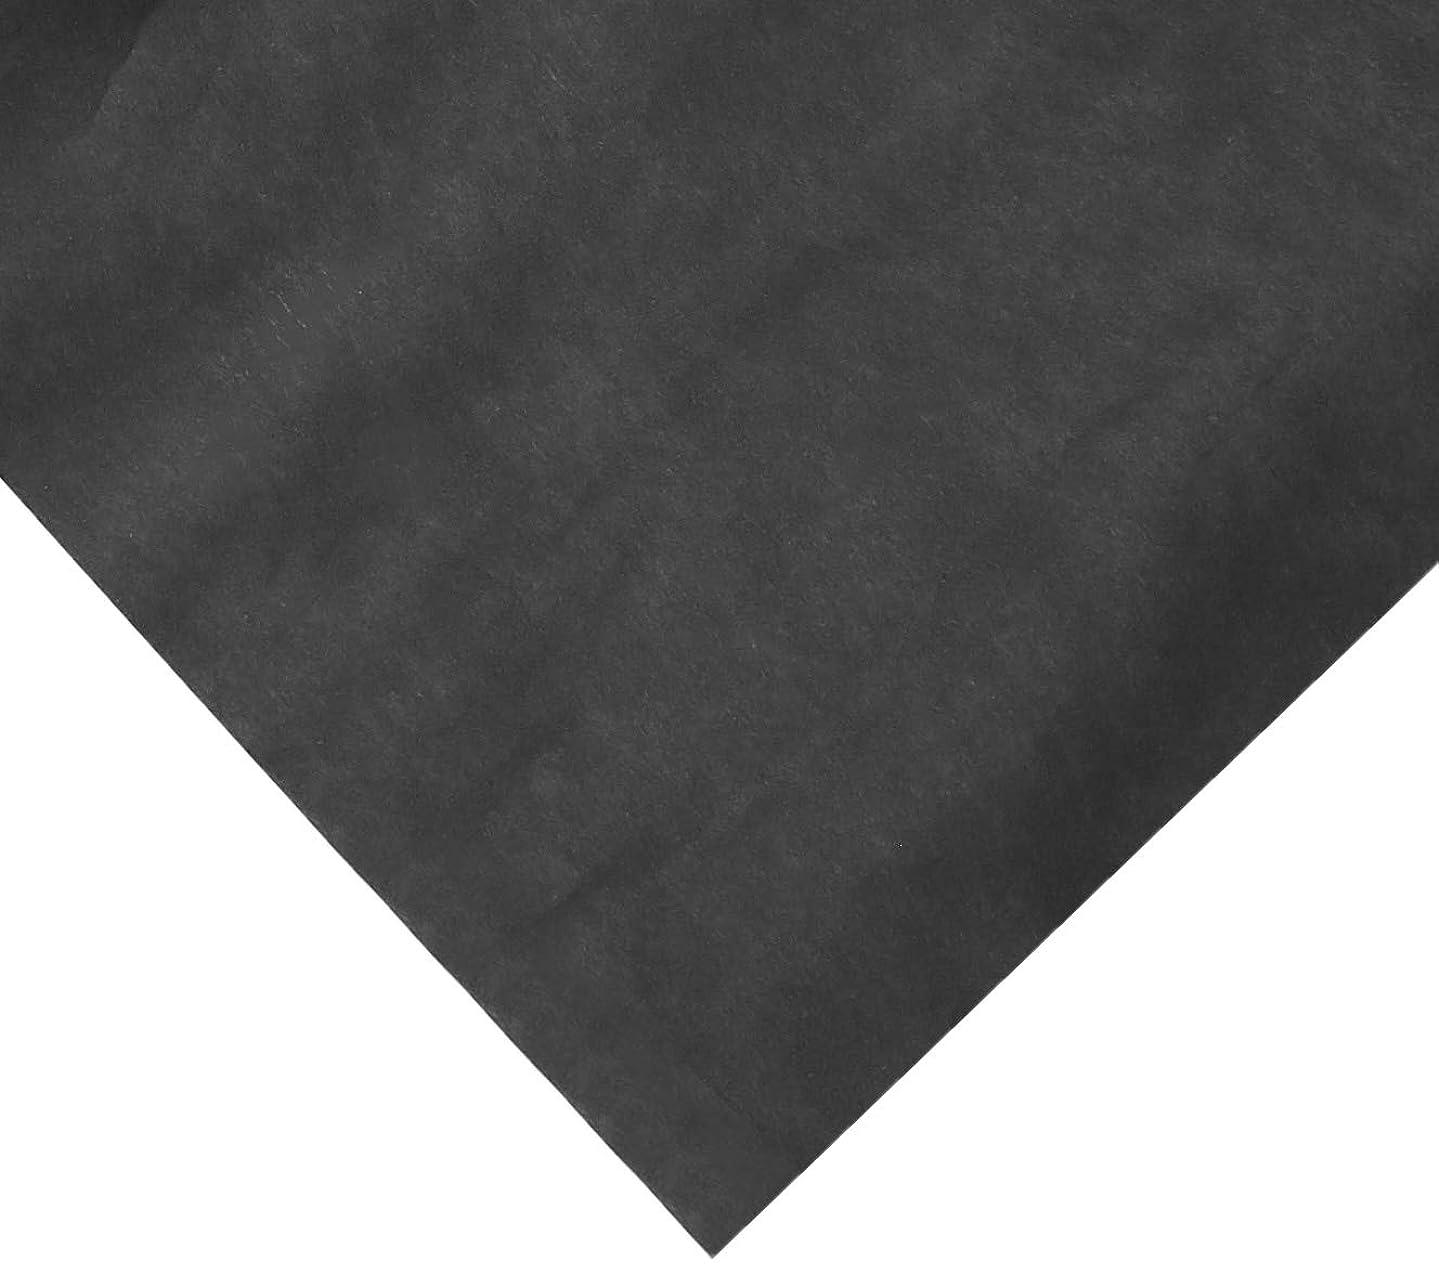 Rainbow Kraft 353012 Duo-Finish Kraft Light-Weight Paper Roll, 36 in x 100 ft,  Black